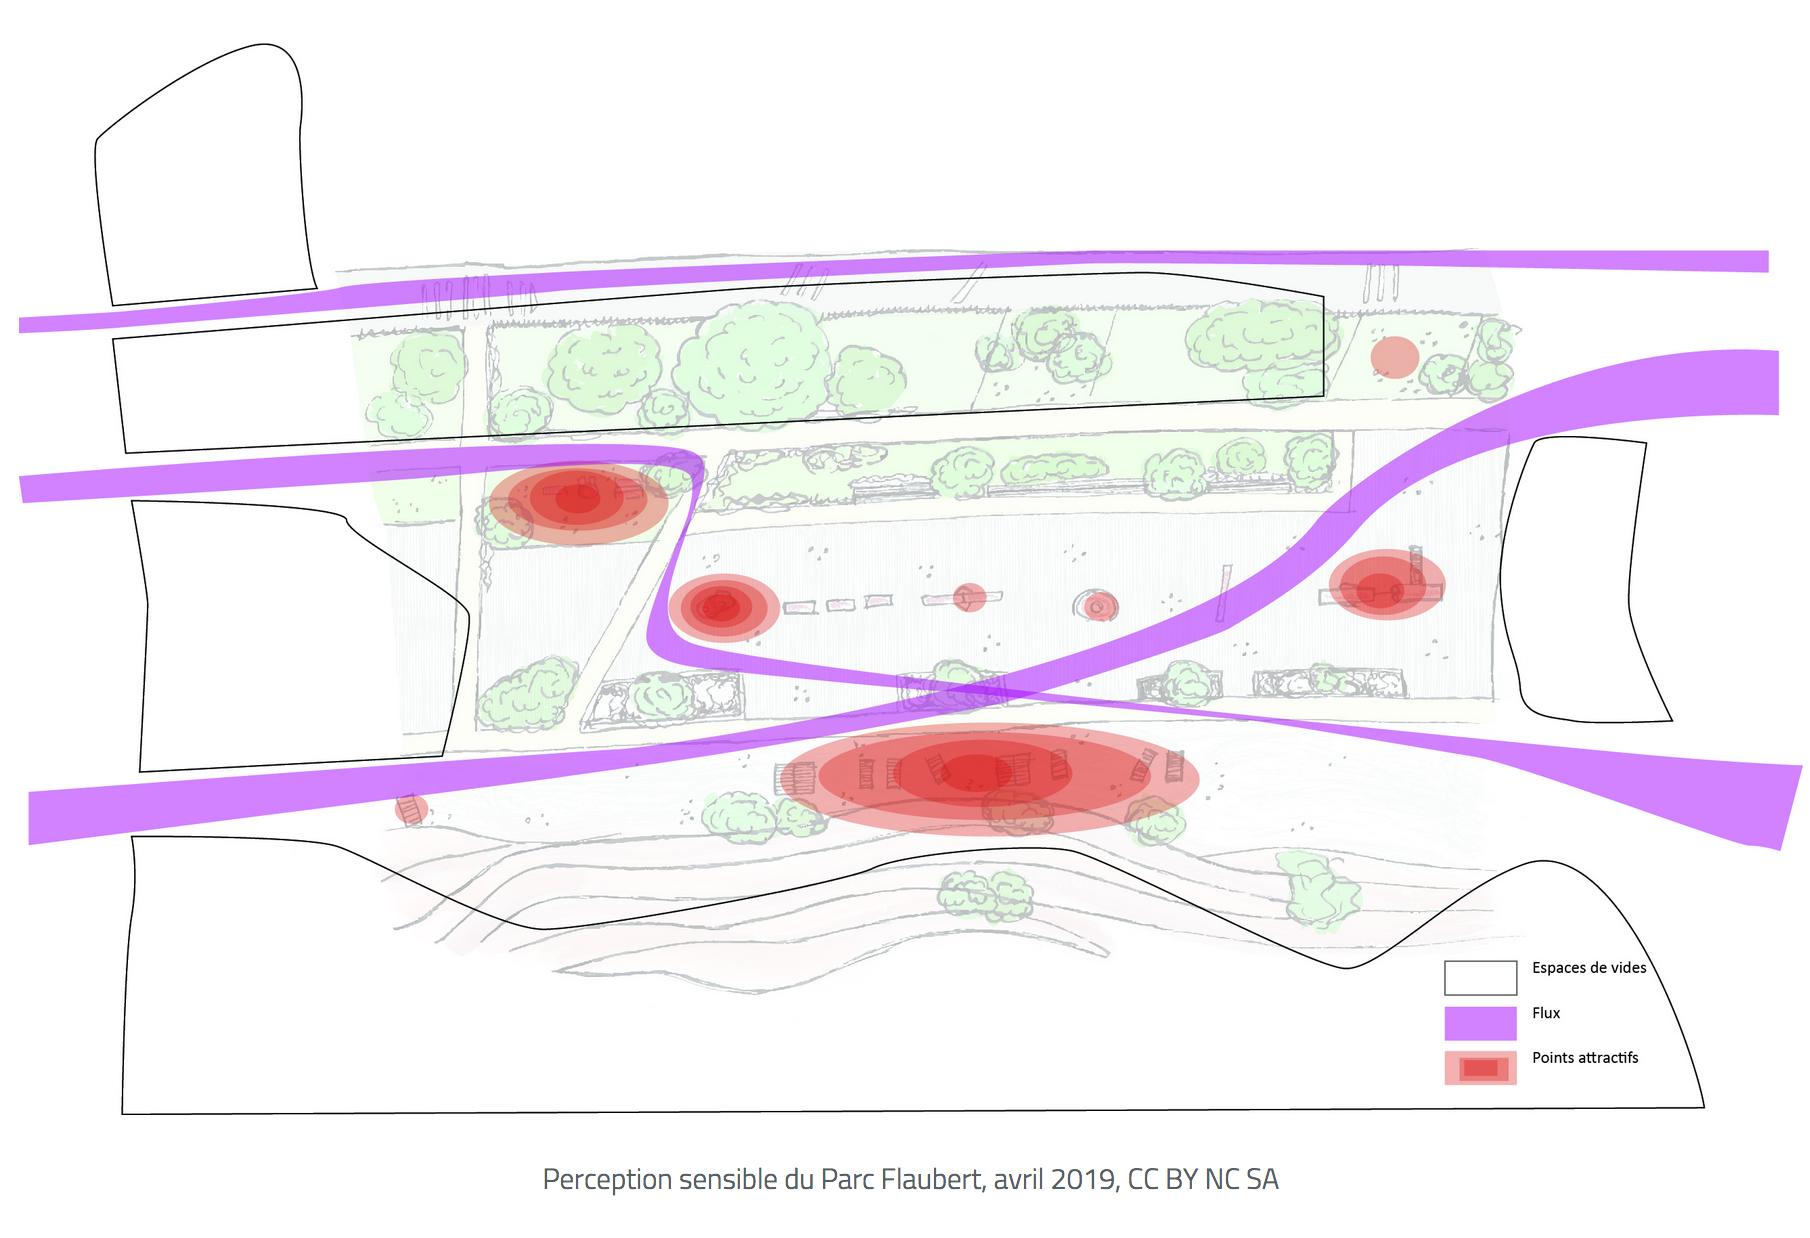 Perception sensible du Parc Flaubert, avril 2019, CC BY NC SA